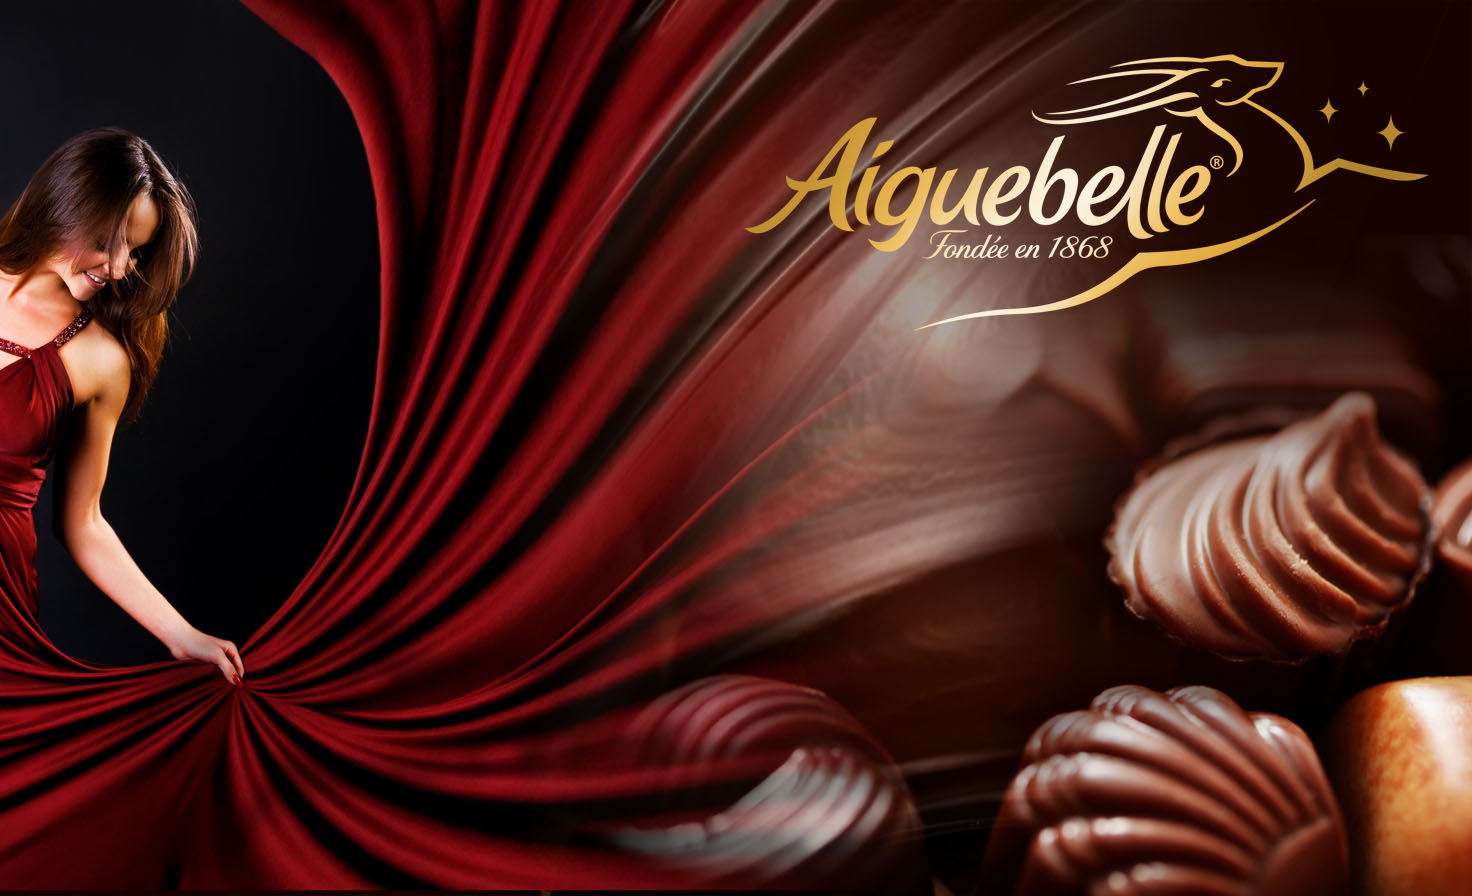 Affiche Chocolat Aiguebelle